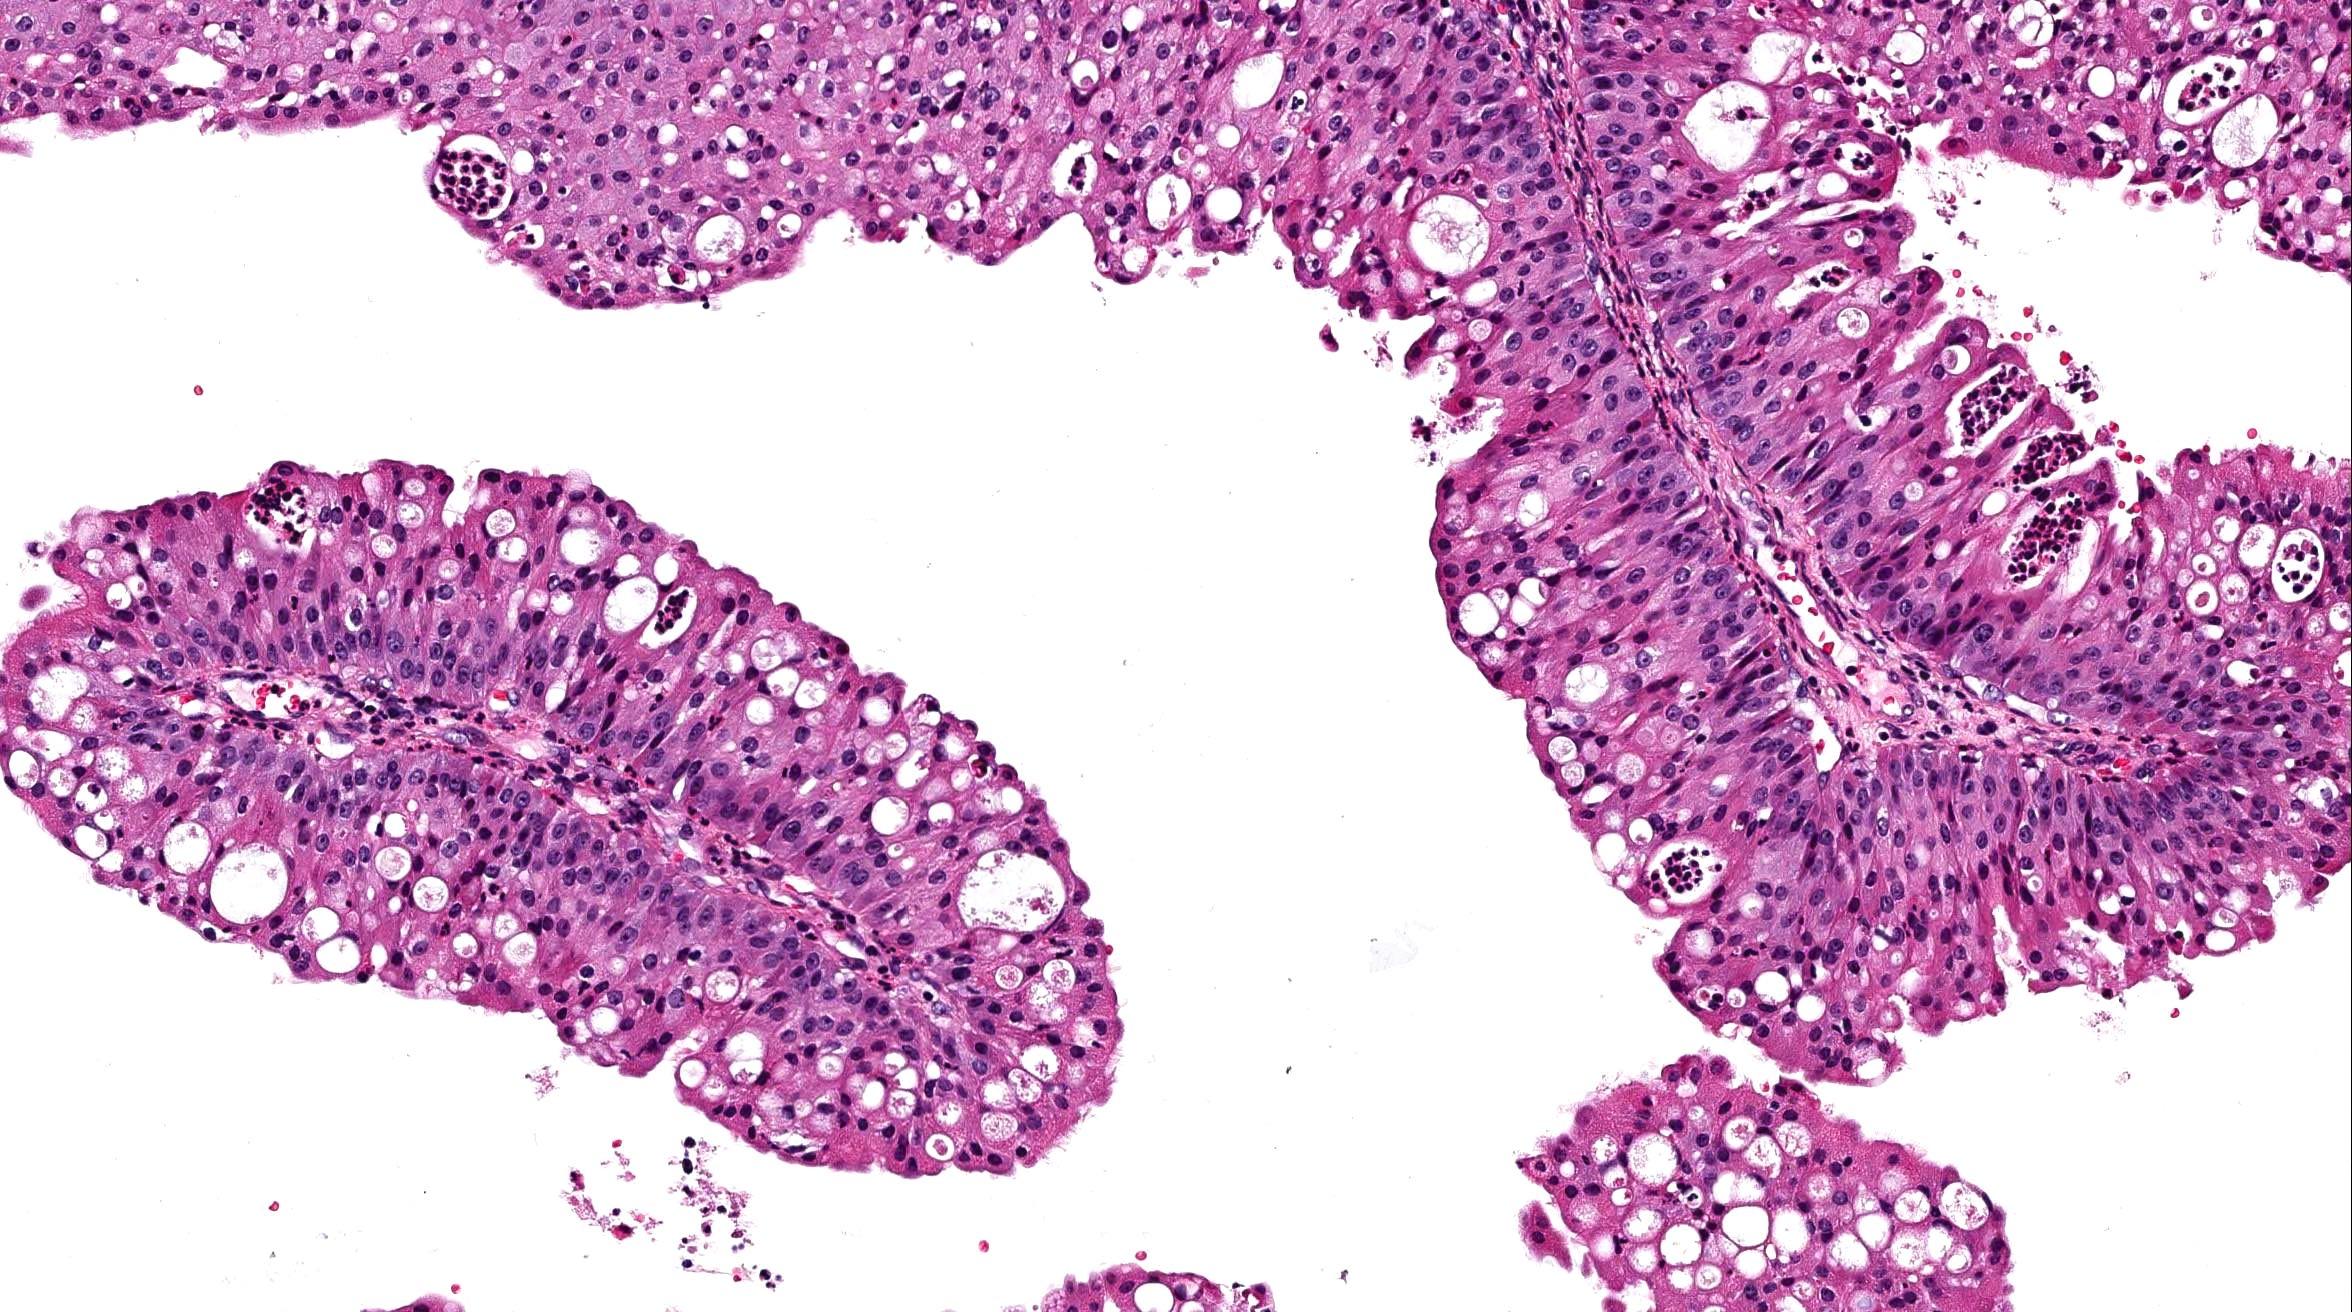 sinonasal papilloma exophytic hpv virus genezen